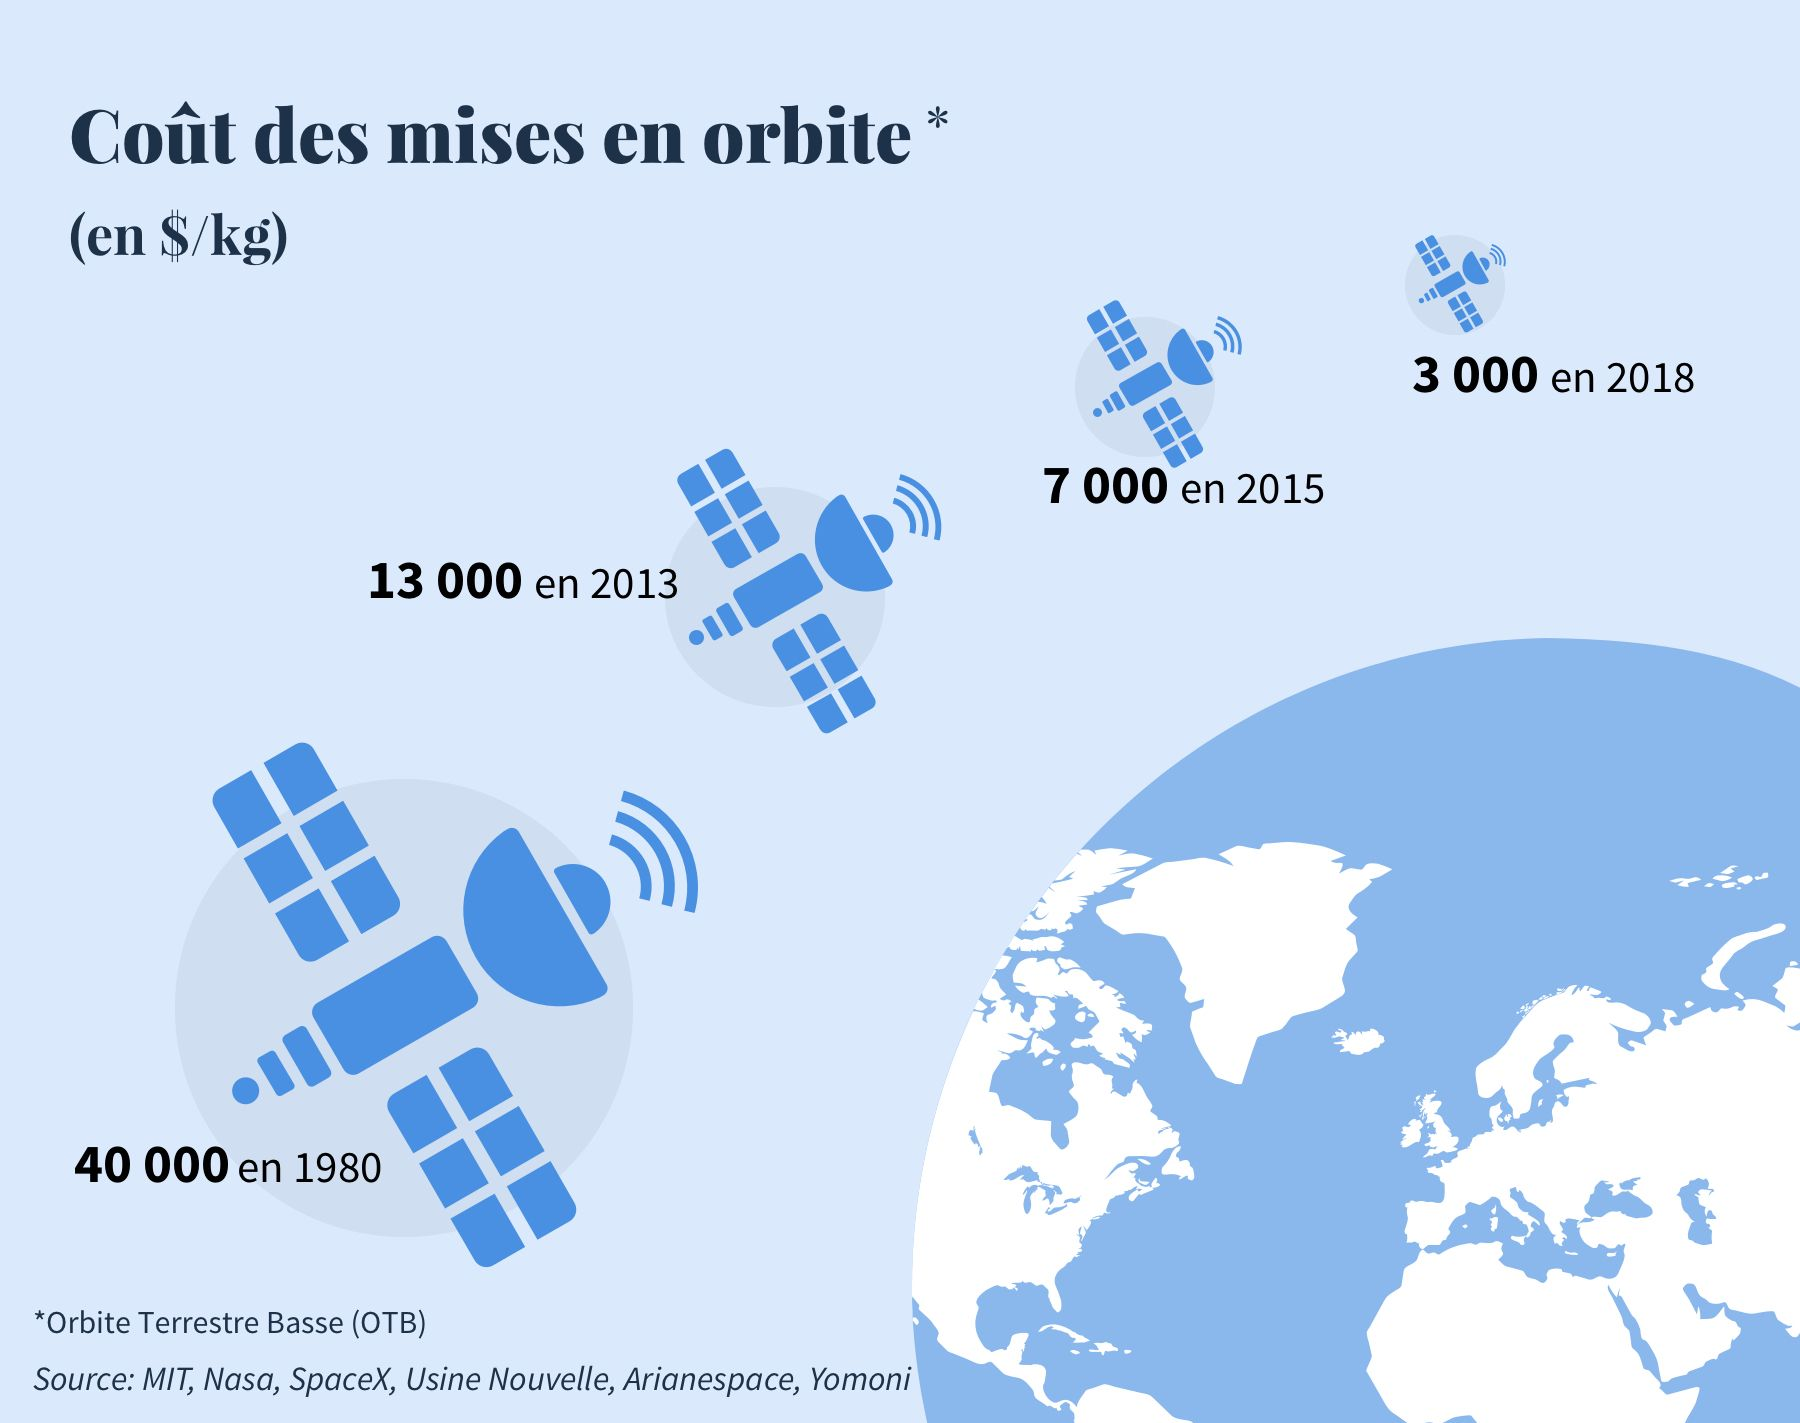 coût de mise en orbite